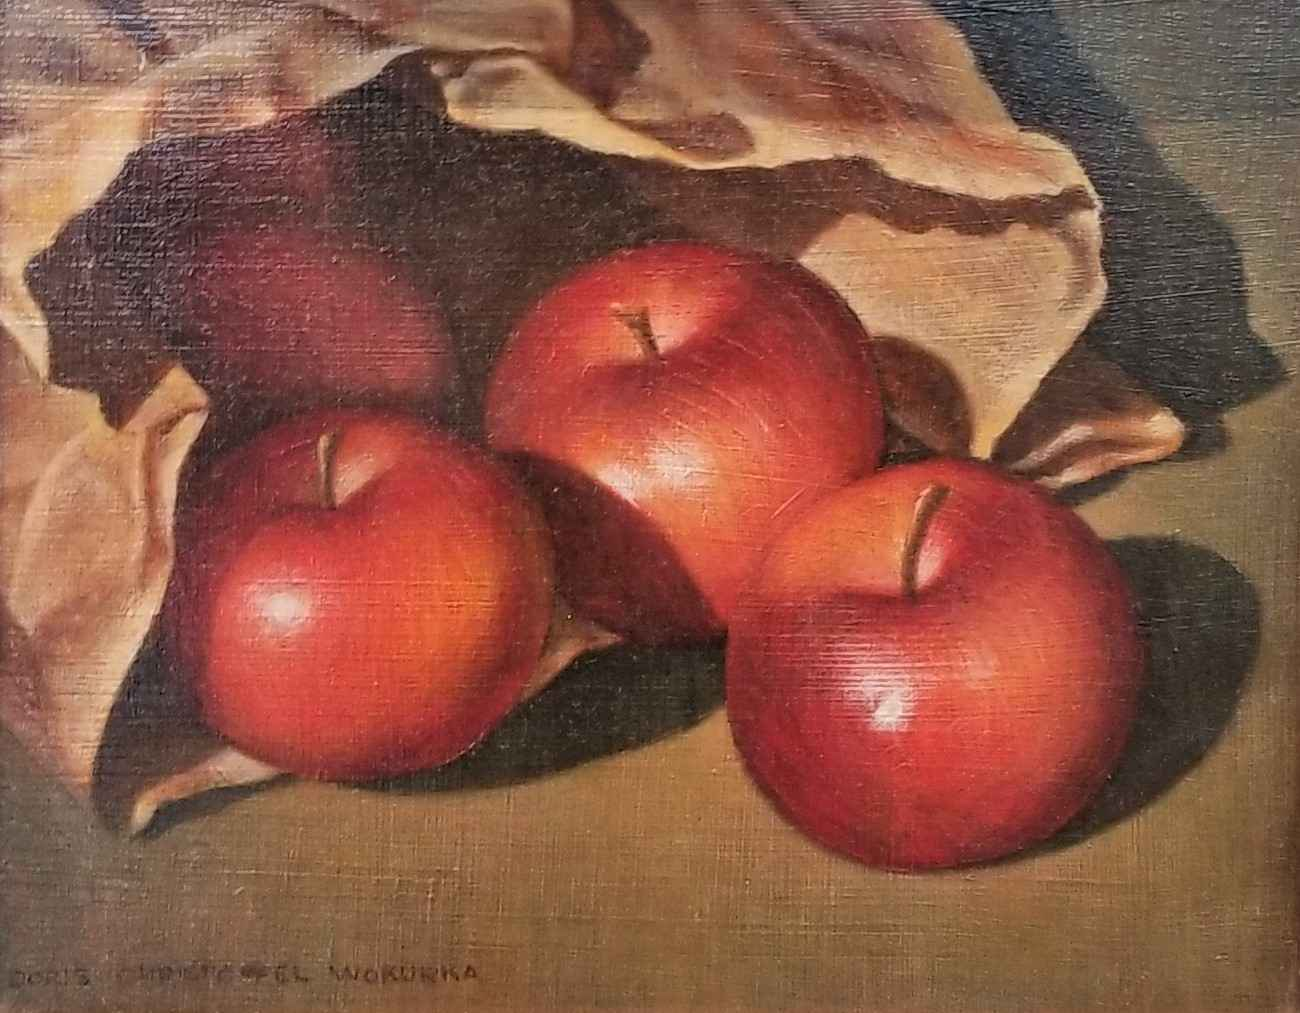 Untitled (Red Apples ... by Ms. Doris Wokurka - Masterpiece Online